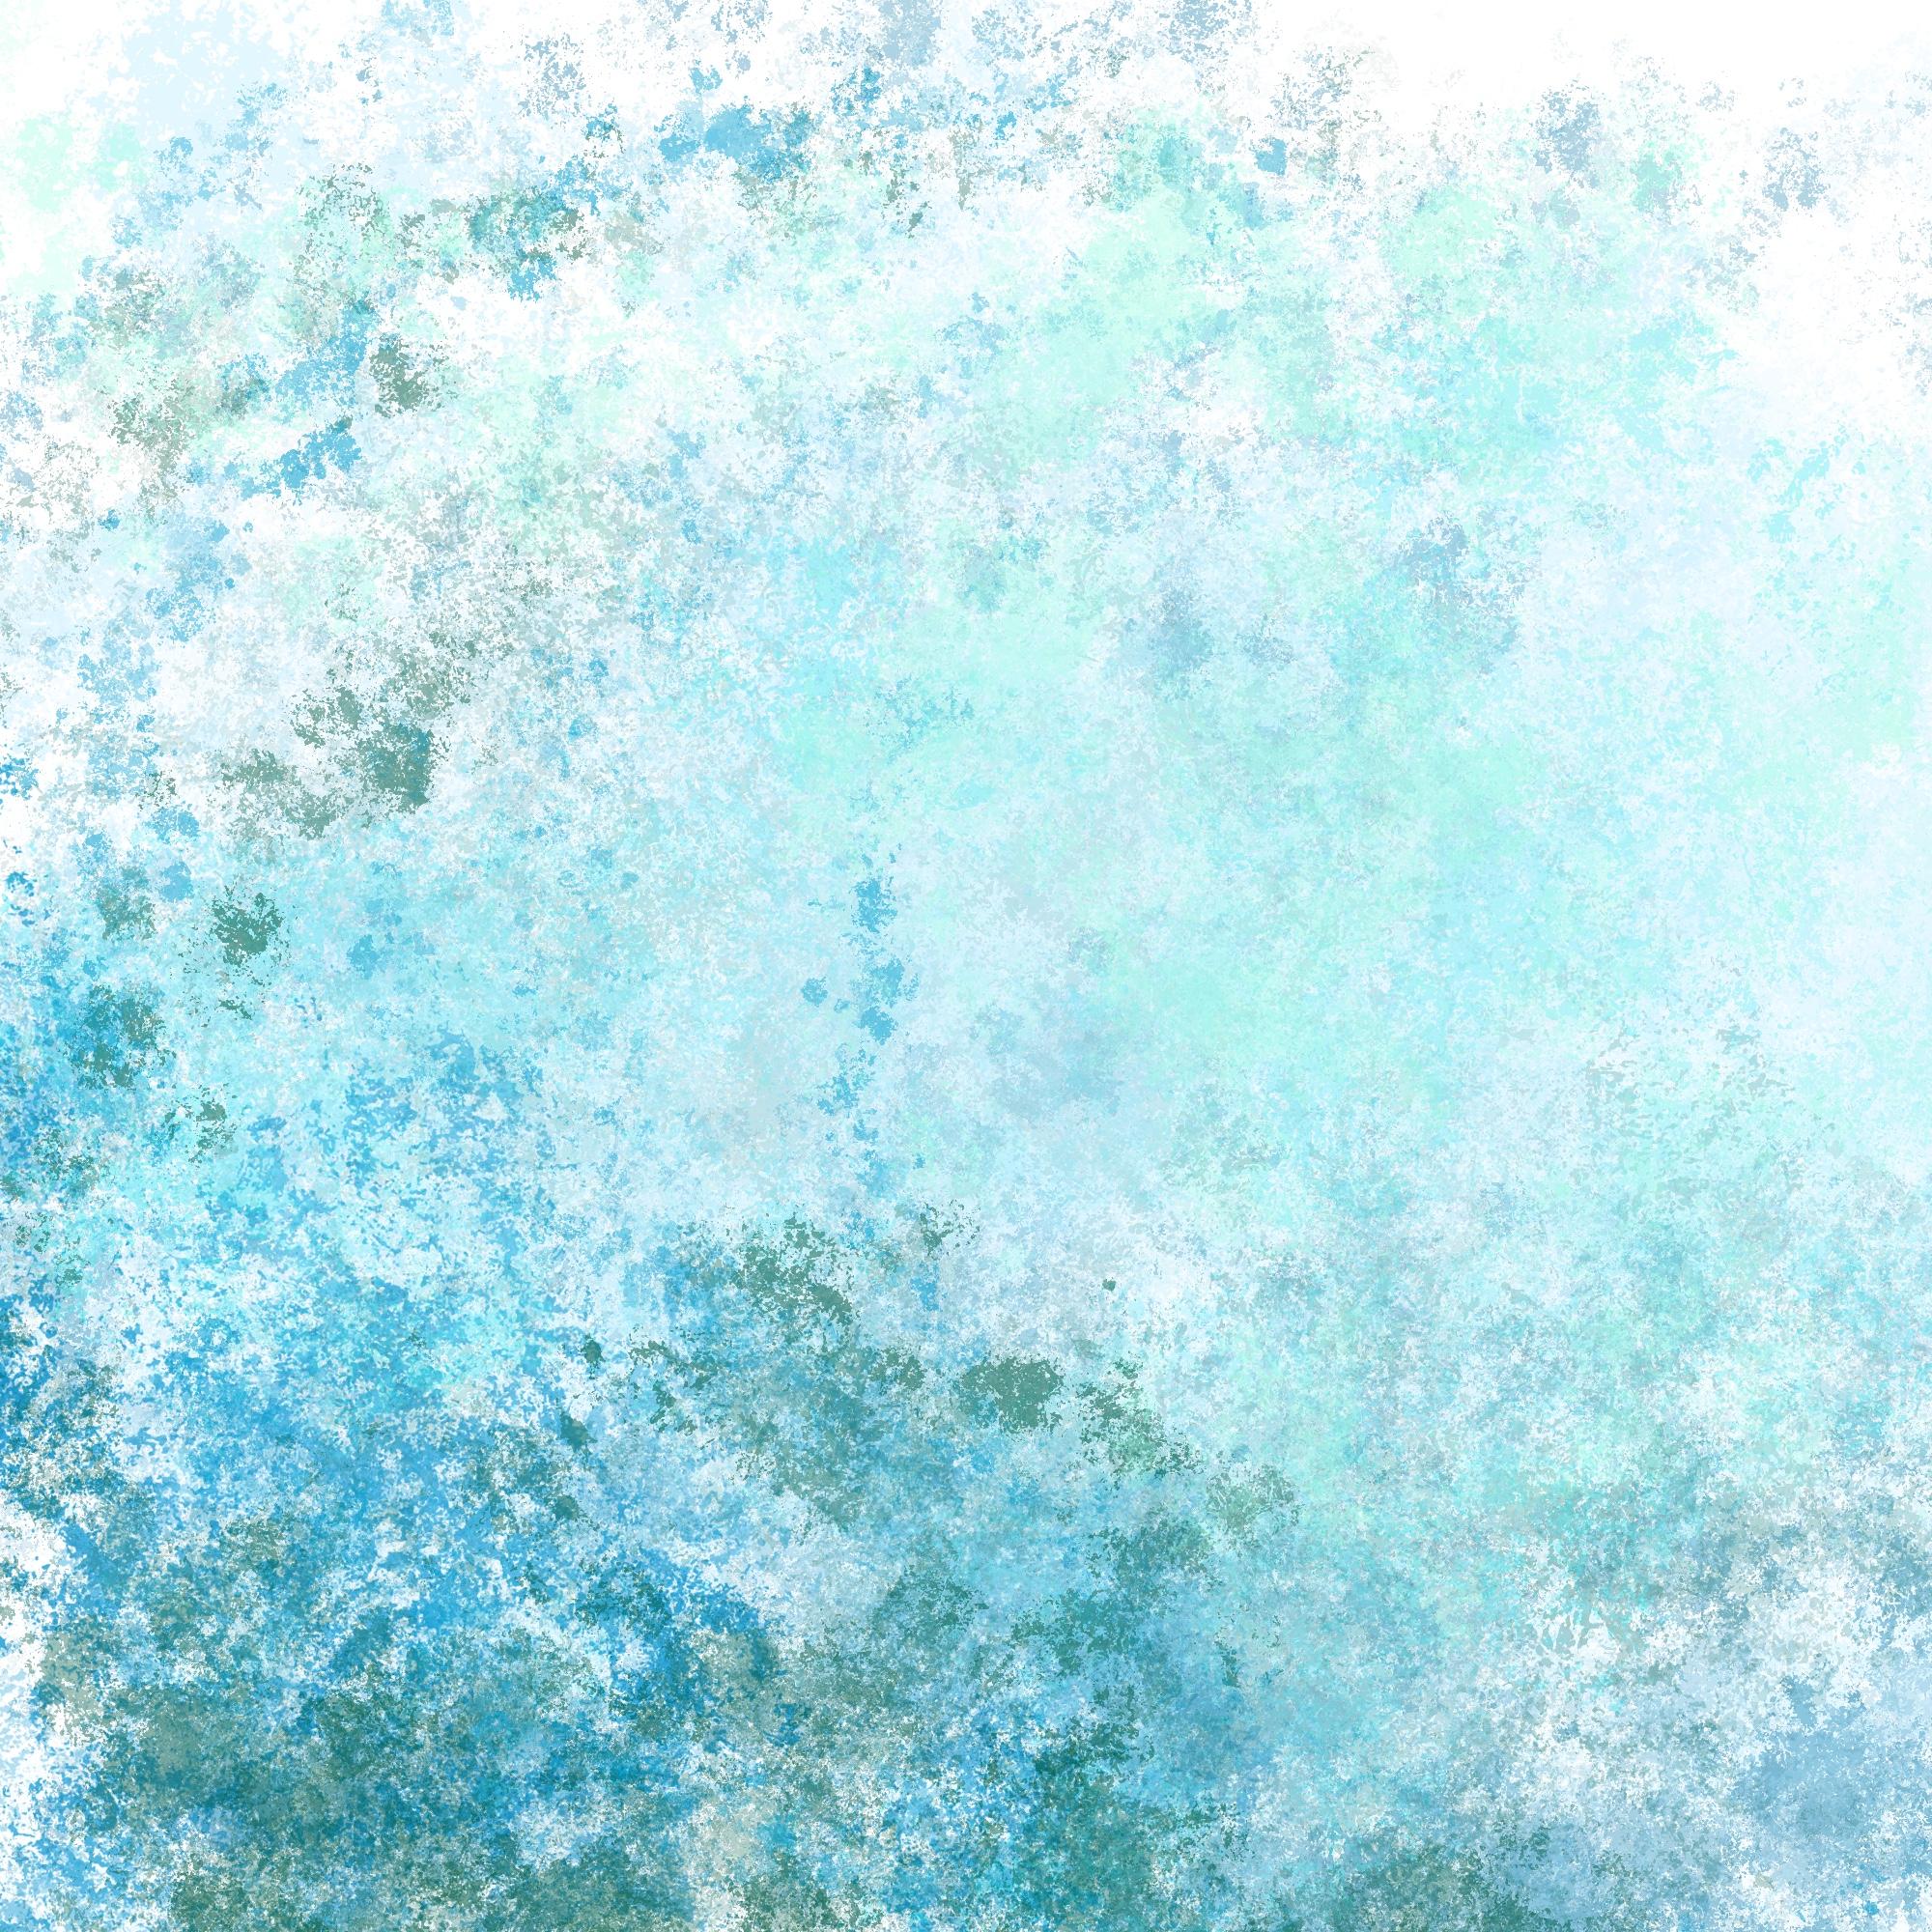 Turbulent Water - FREE